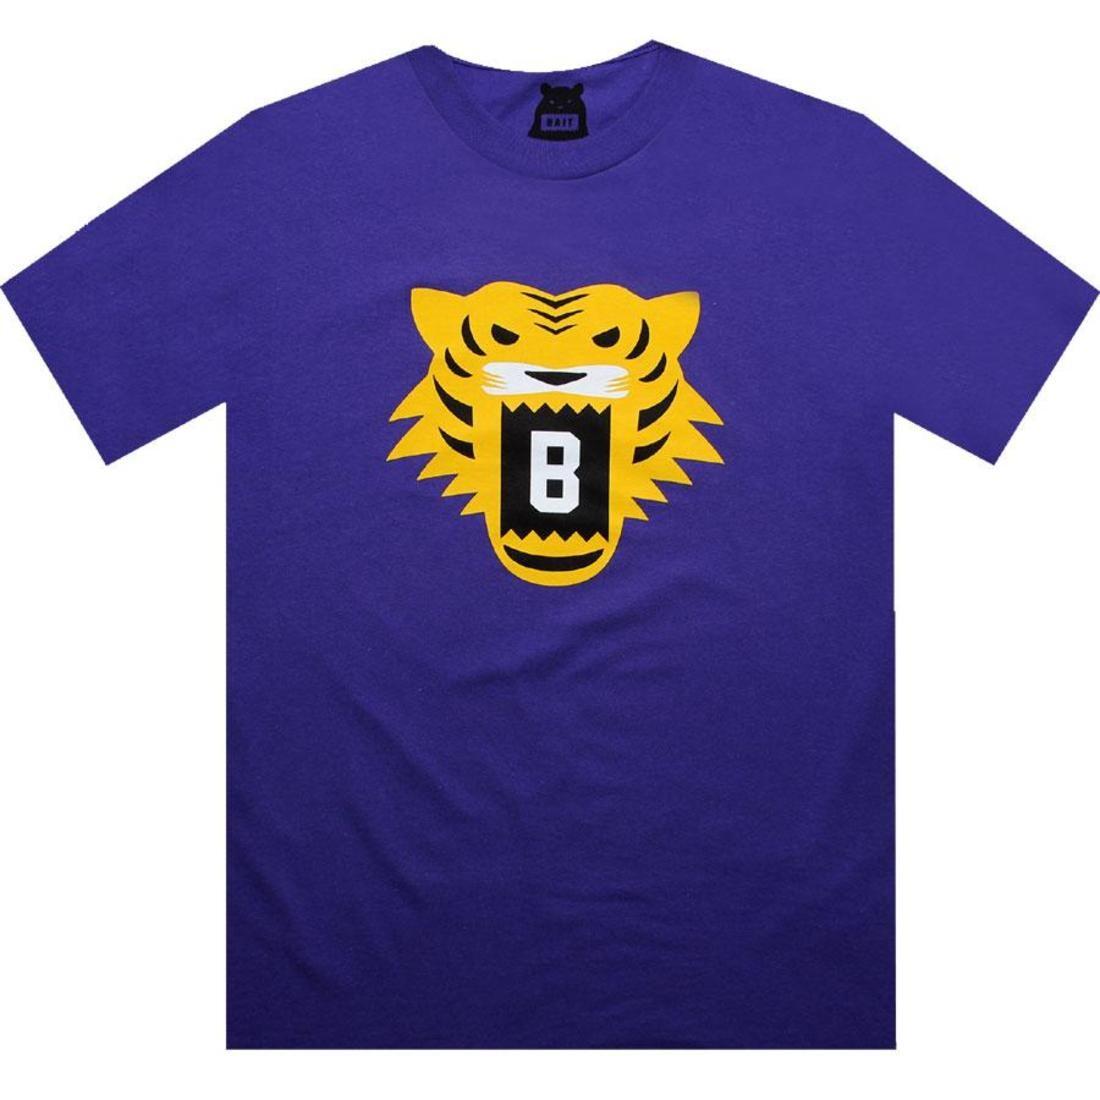 BAIT Tiger Tee (purple / yellow)